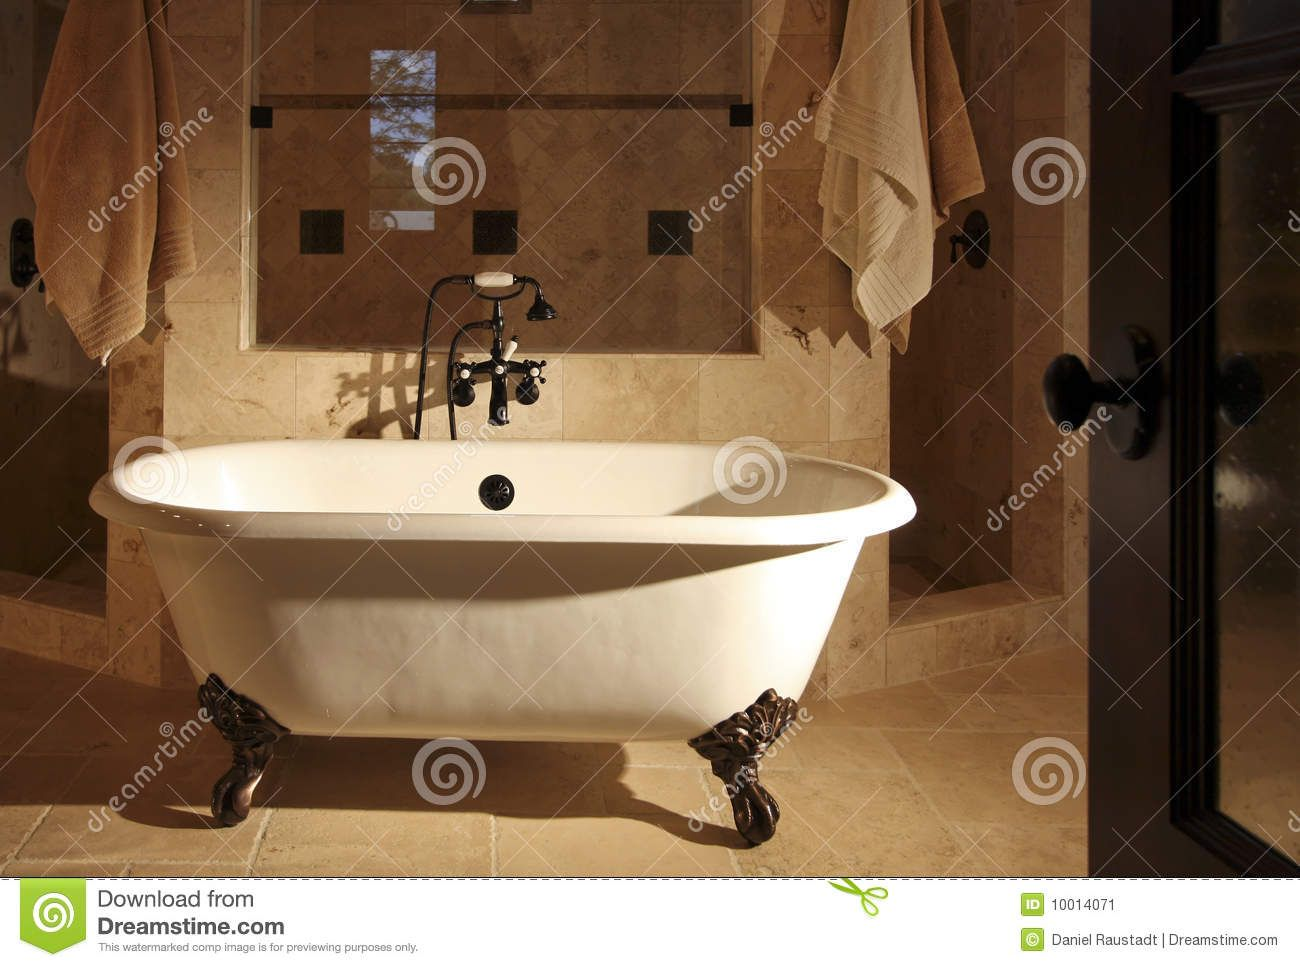 Bathrooms with a Claw foot Tub | I Love Claw footed Bathtubs ...